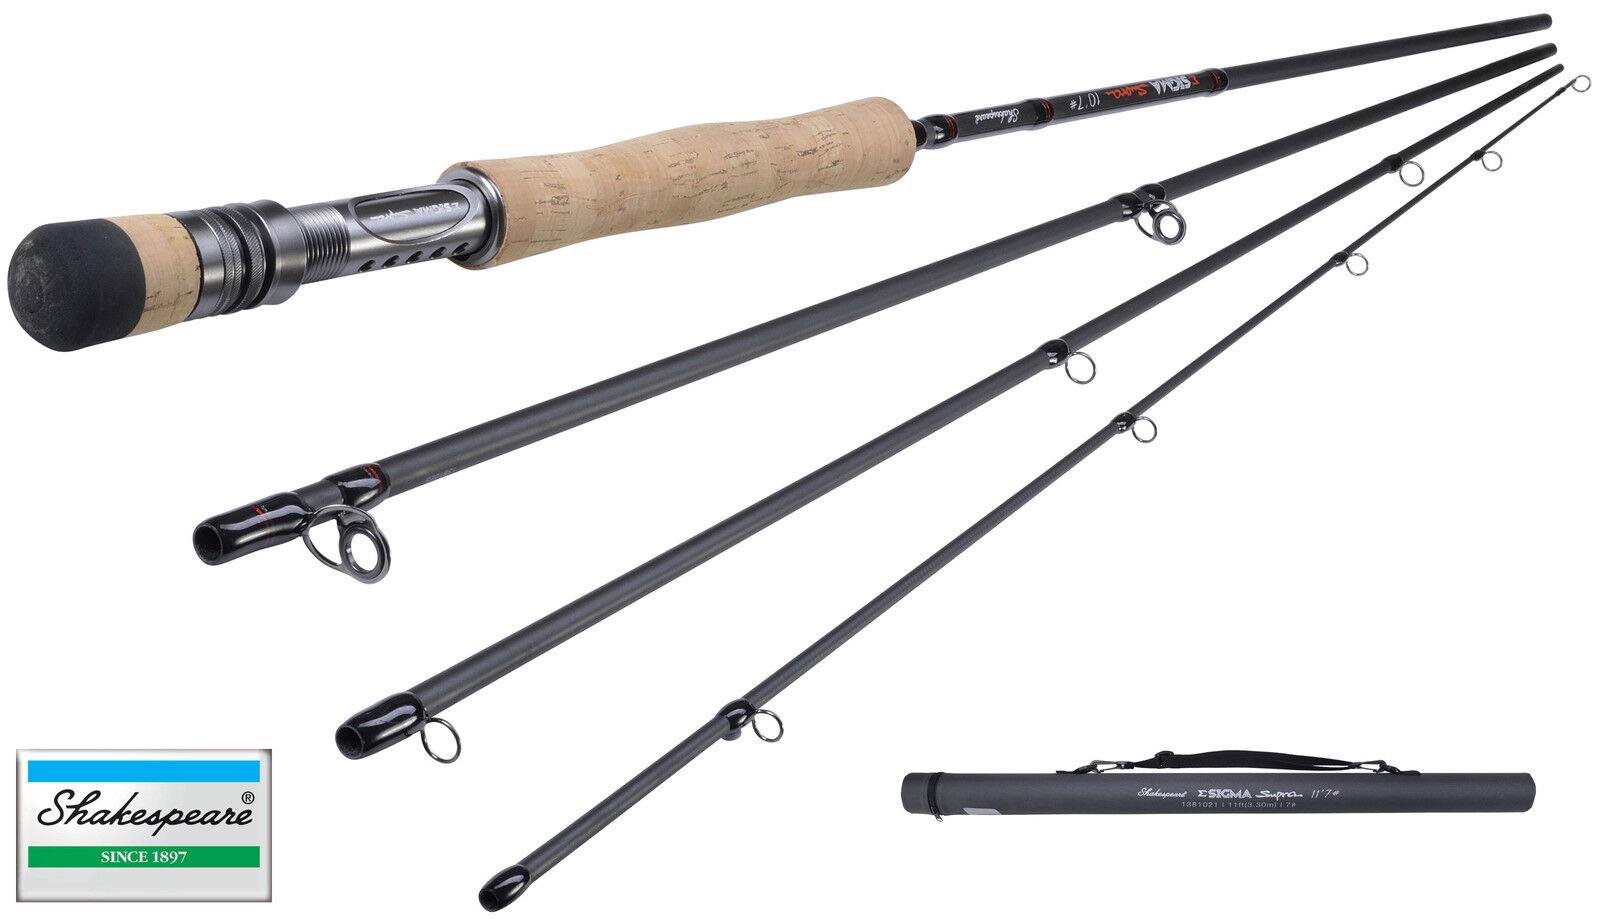 NUOVO Shakespeare Sigma SUPRA Fly Fishing Rod 7ft - 11ft 4pc tutti i modelli disponibili